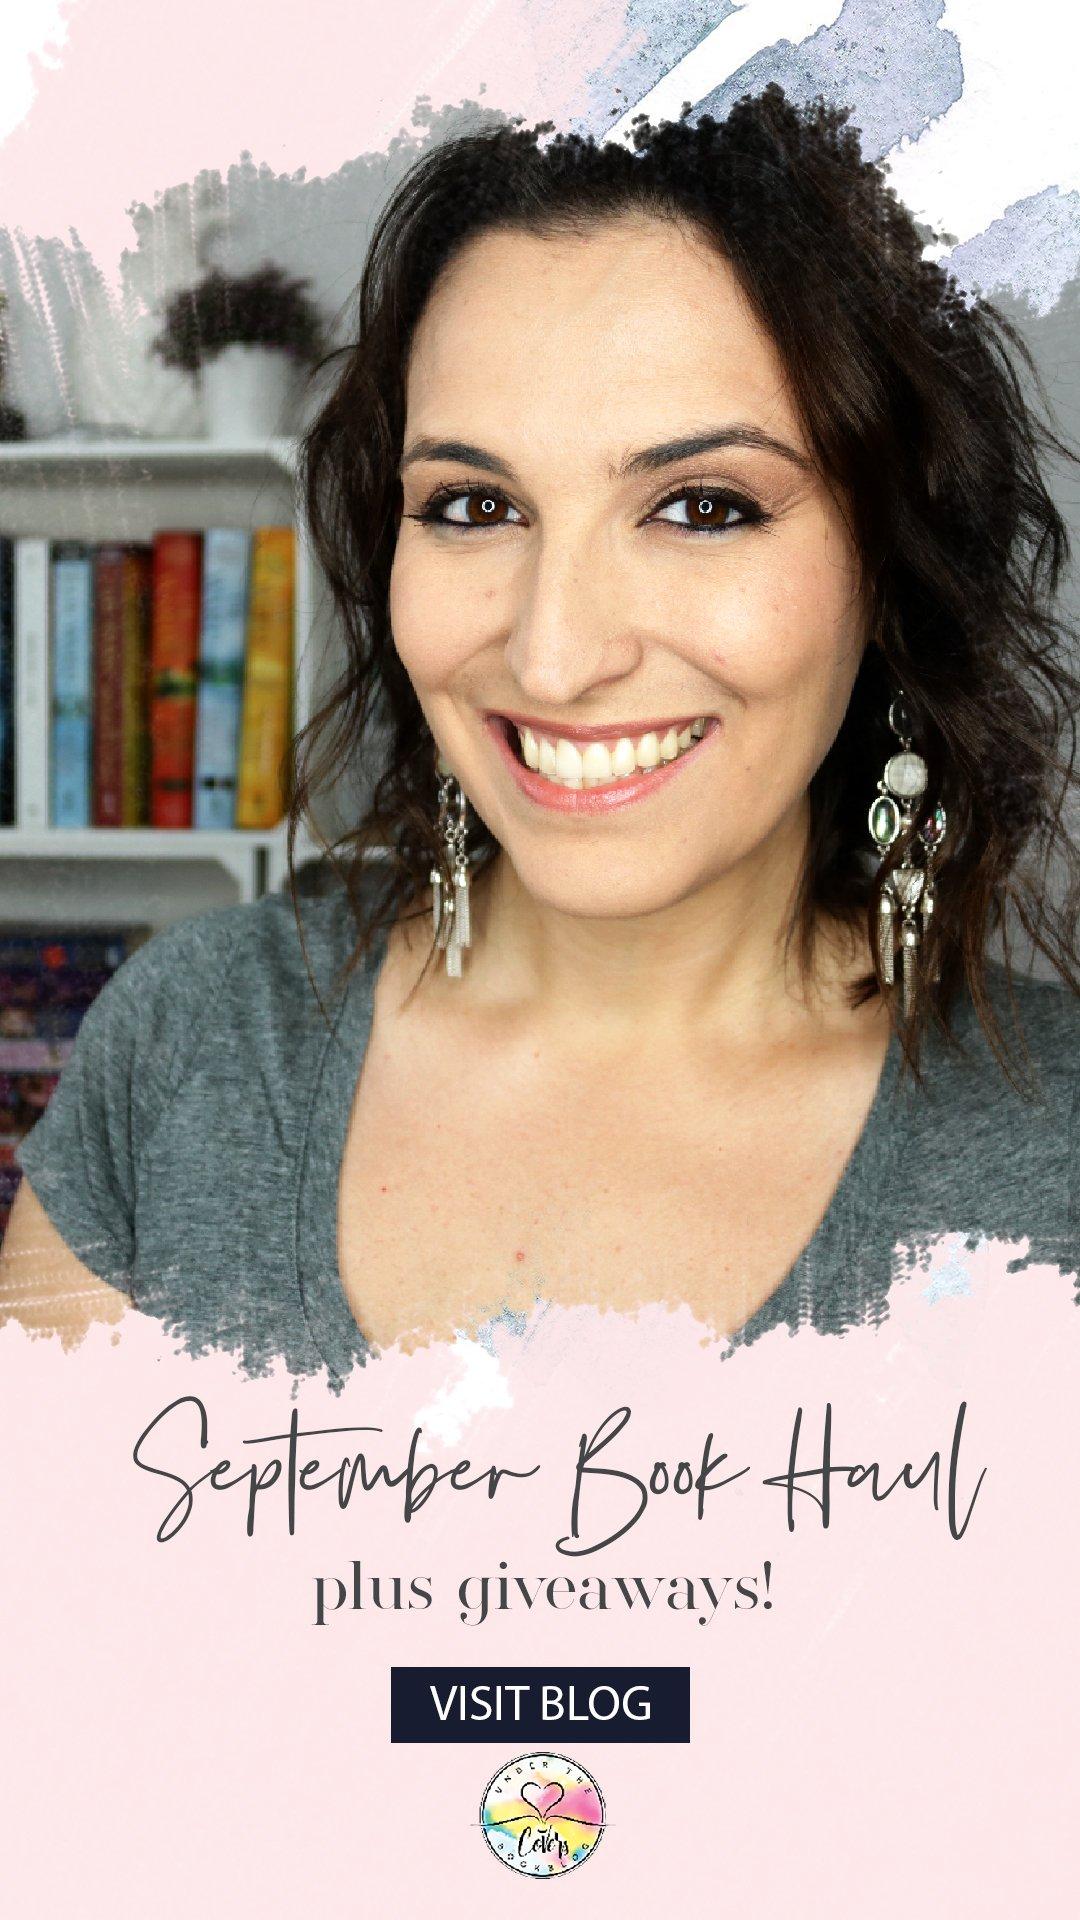 Book Haul + Giveaway: September 2018